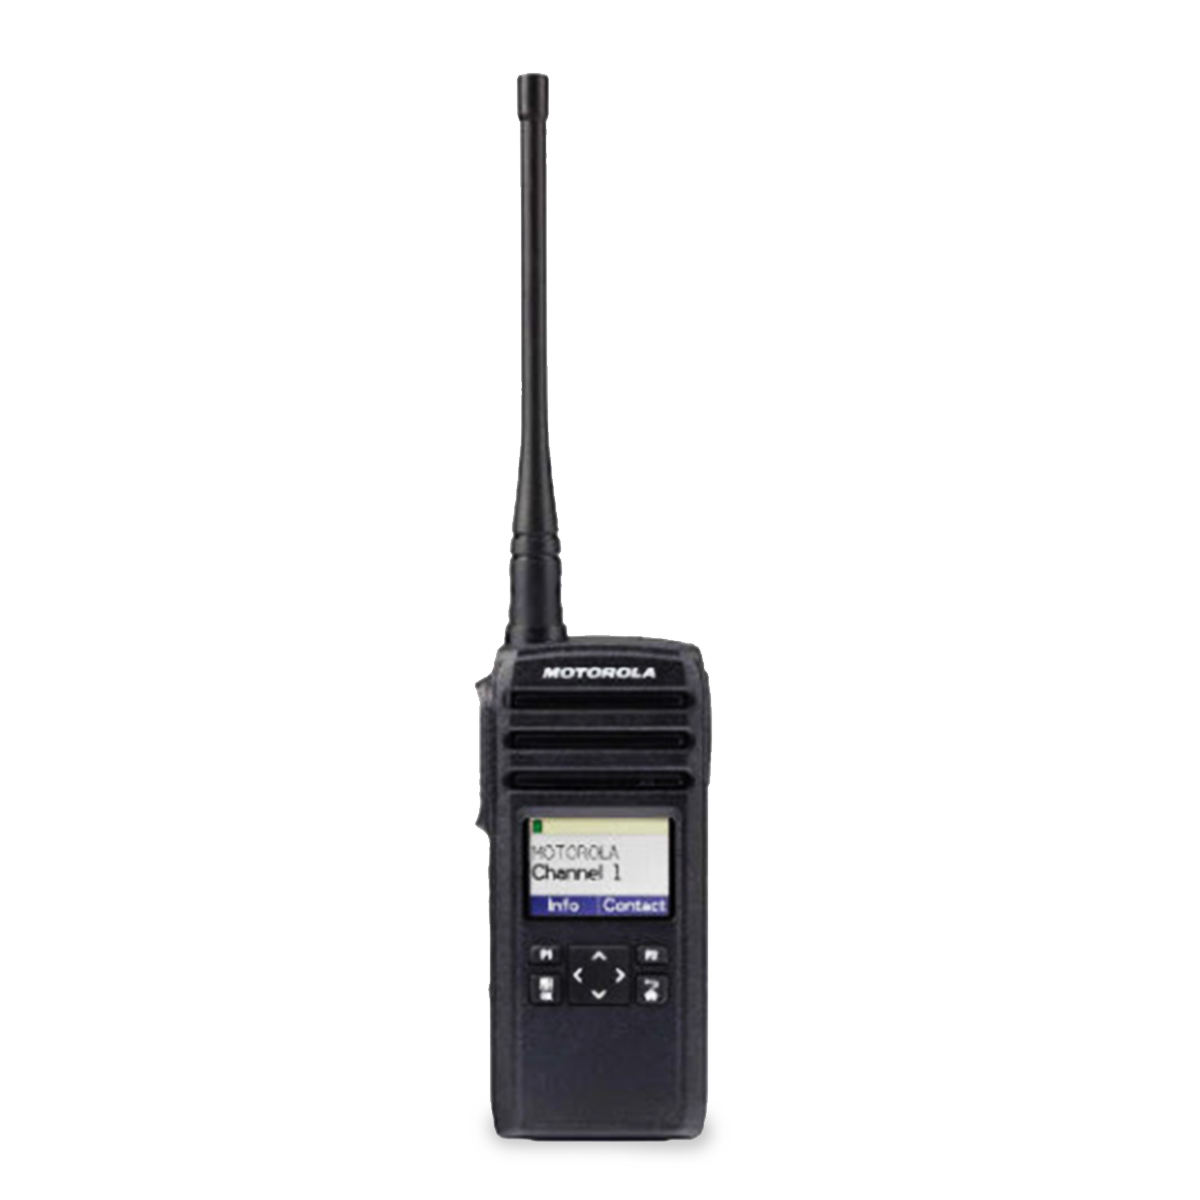 Radio Motorola DTR720 Digital 902-928 MHz